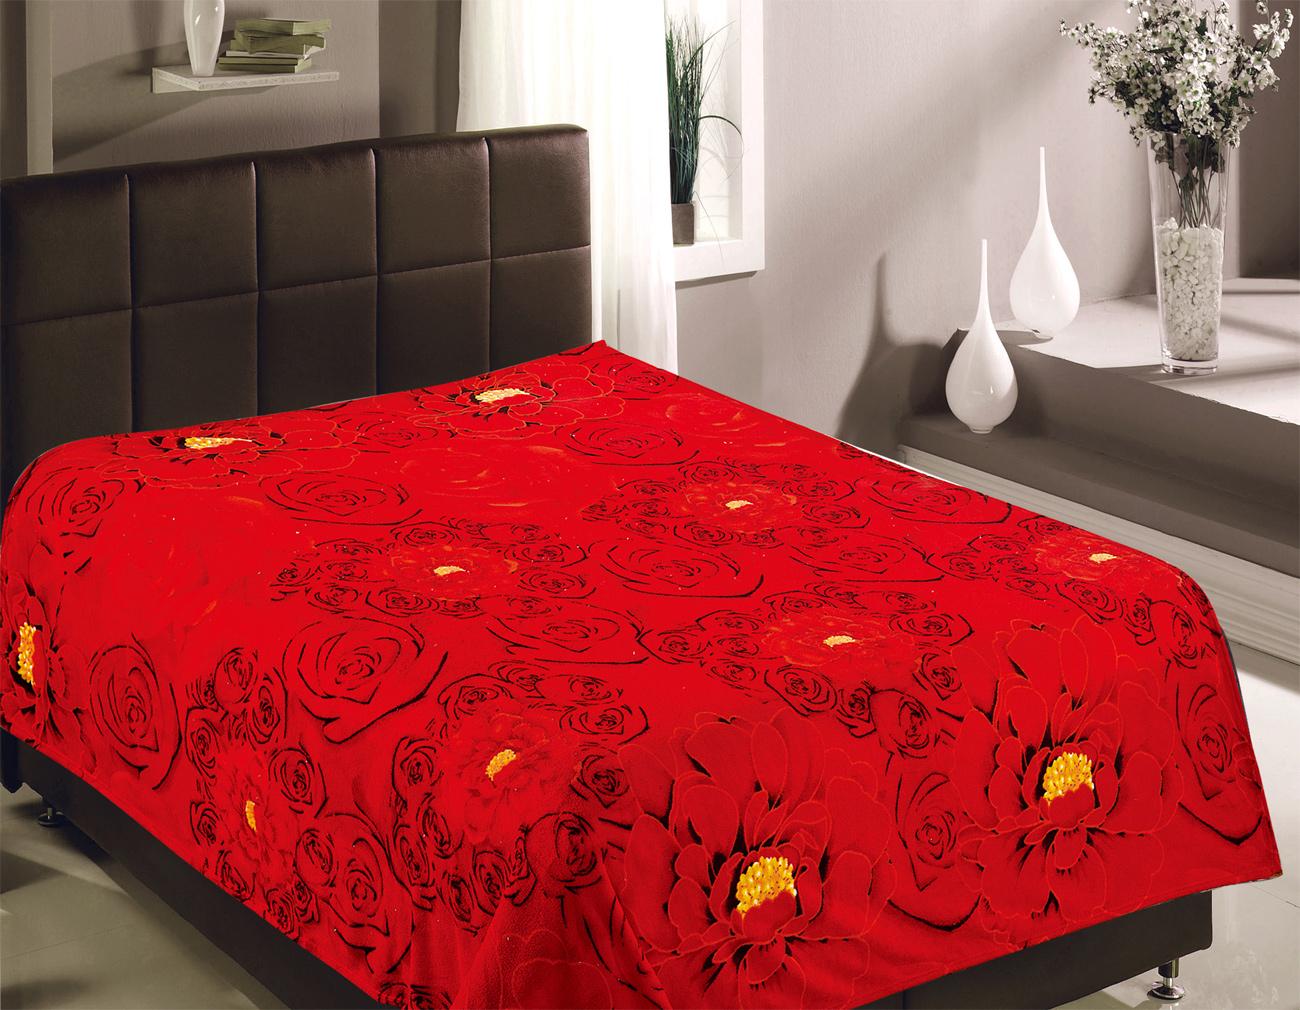 Плед TexRepublic Плед Розы Цвет: Красный (150х200 см) плед из микрофибры минни маус shopping цвет красный 150 см х 200 см